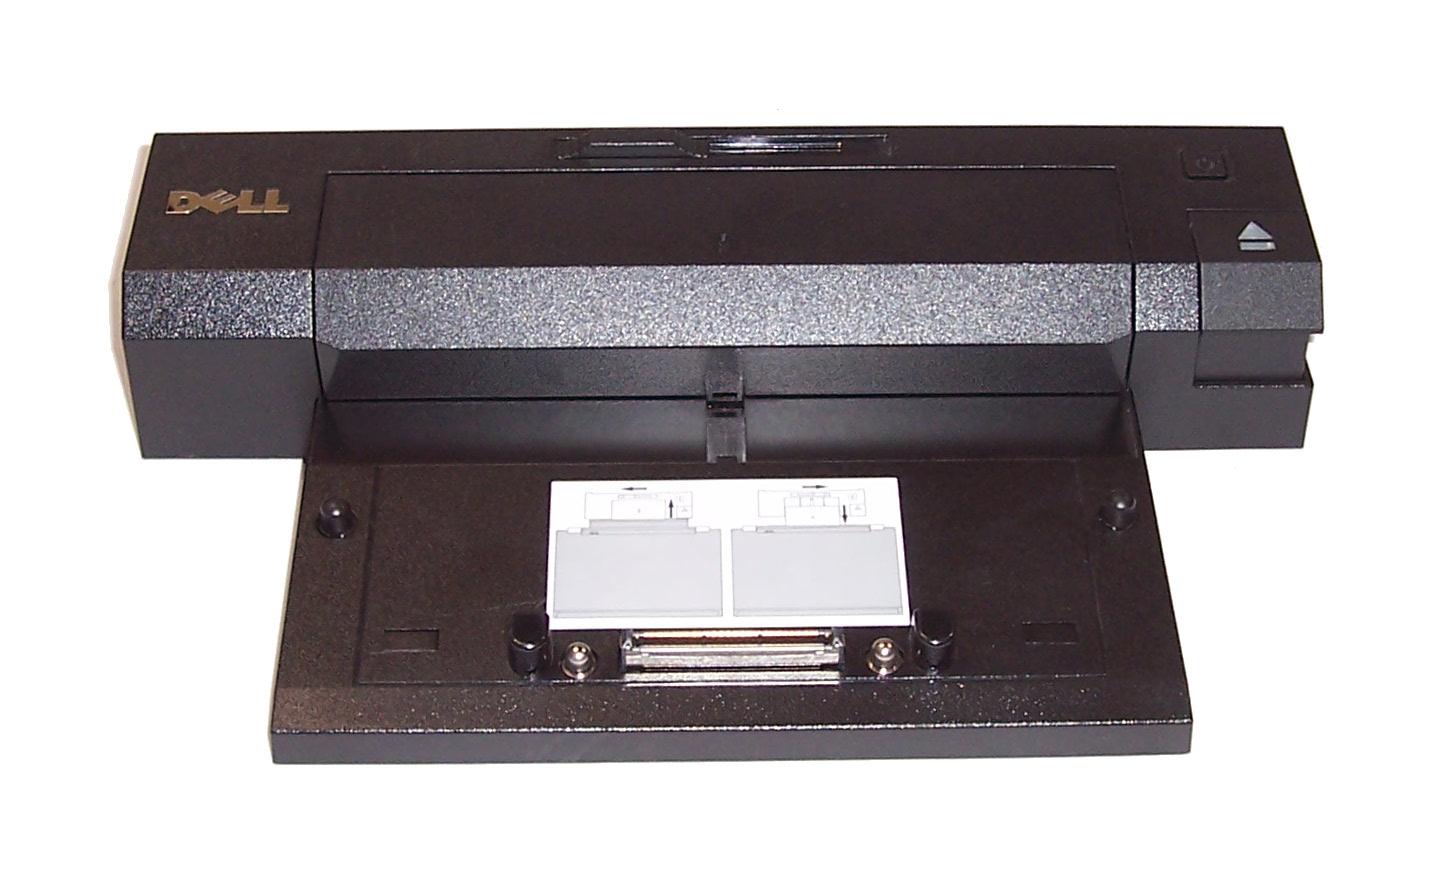 Dell PKDGR E-Port Plus Laptop Docking Station With eSATA, DVI-D ,USB3.0 Port